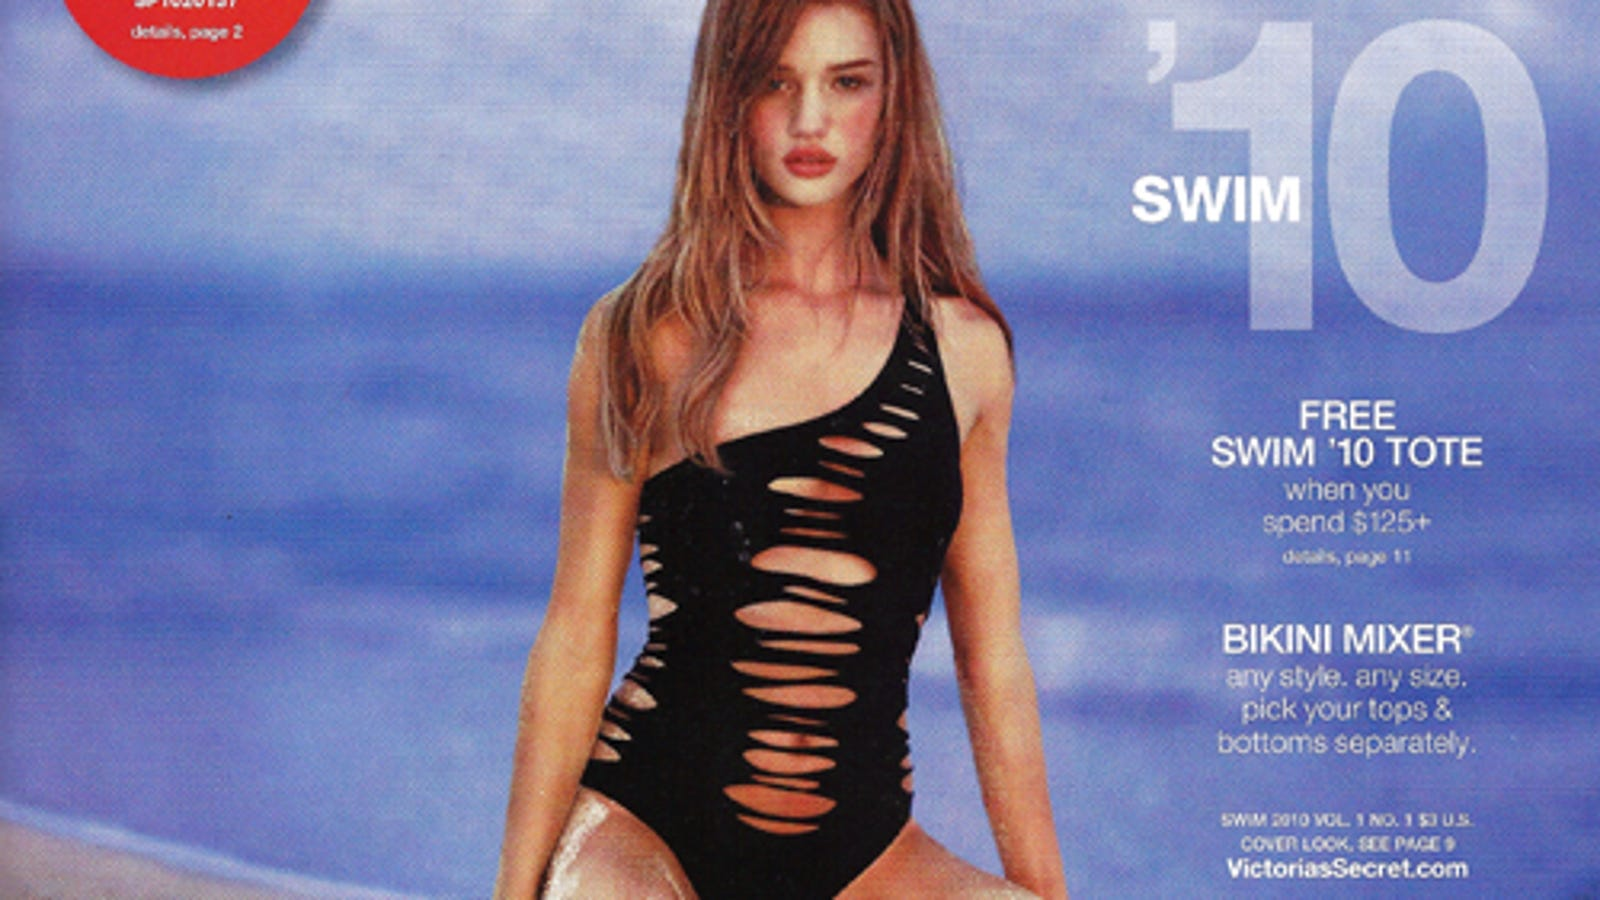 2fba710f08 Post-Holiday Bloat? Tough: It's Swimsuit Season At Victoria's Secret